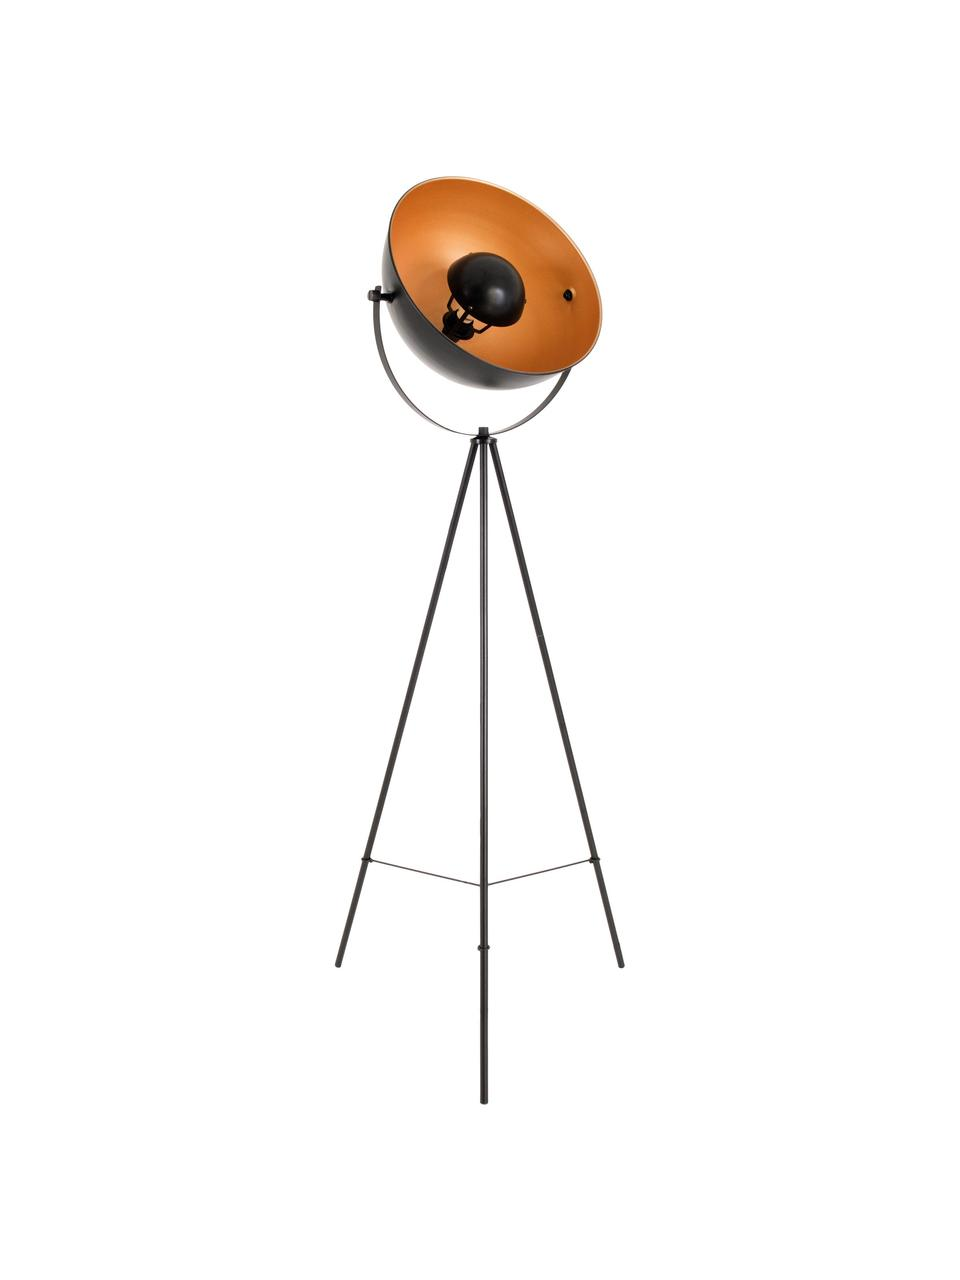 Tripod Stehlampe Bernice in Gold-Schwarz, Lampenschirm: Metall, beschichtet, Lampenfuß: Metall, beschichtet, Schwarz, Goldfarben, Ø 40 x H 150 cm